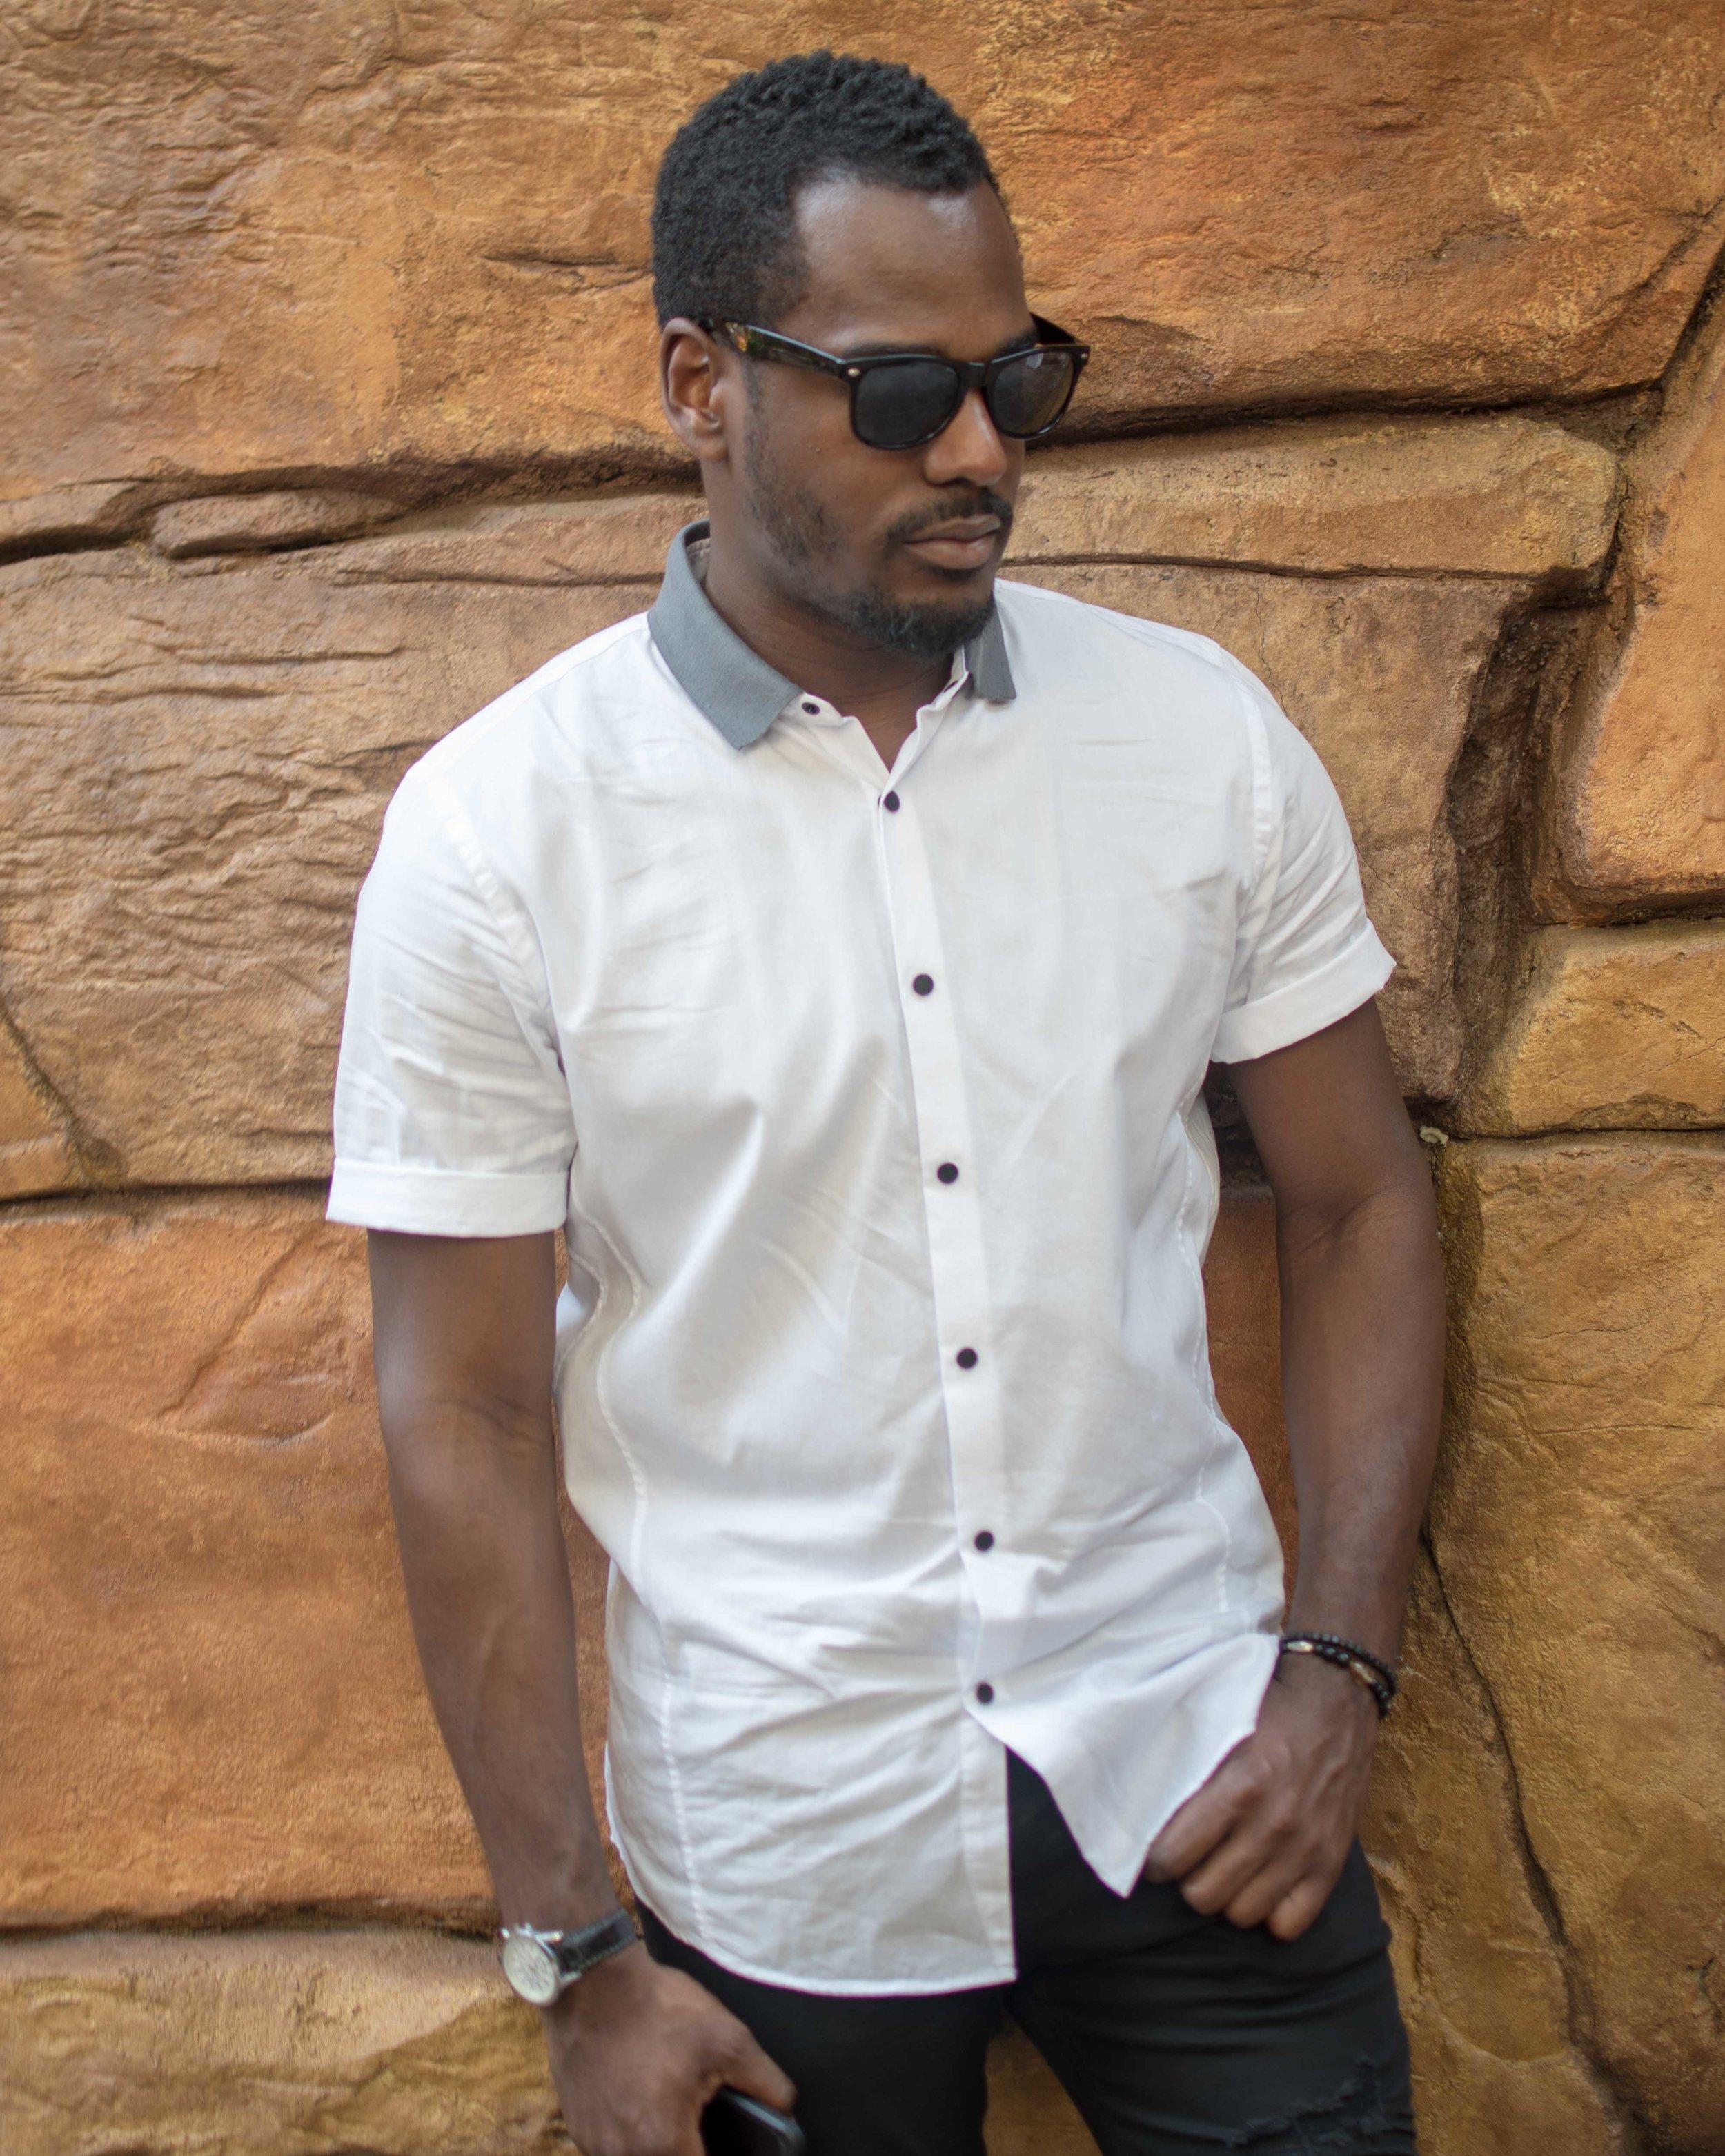 mens fashion spring 2018 gregsstyleguide lindbergh shirt